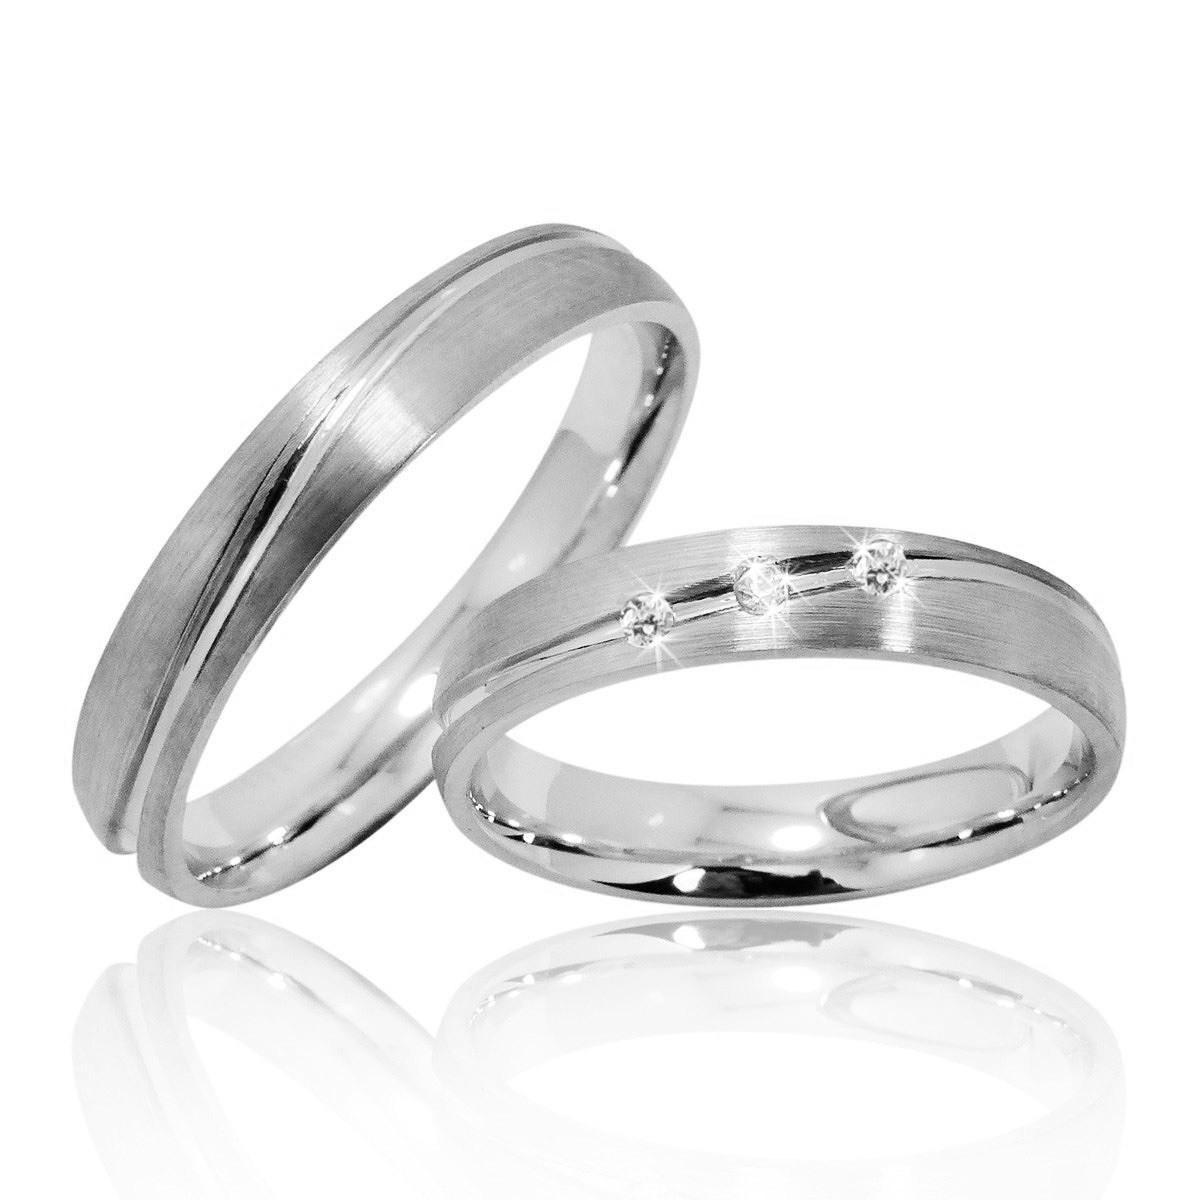 Details Zu 2 Trauringe Silber 925 Mit Gravur+Etui Eheringe Verlobungsringe  Ringe Pr16-3T